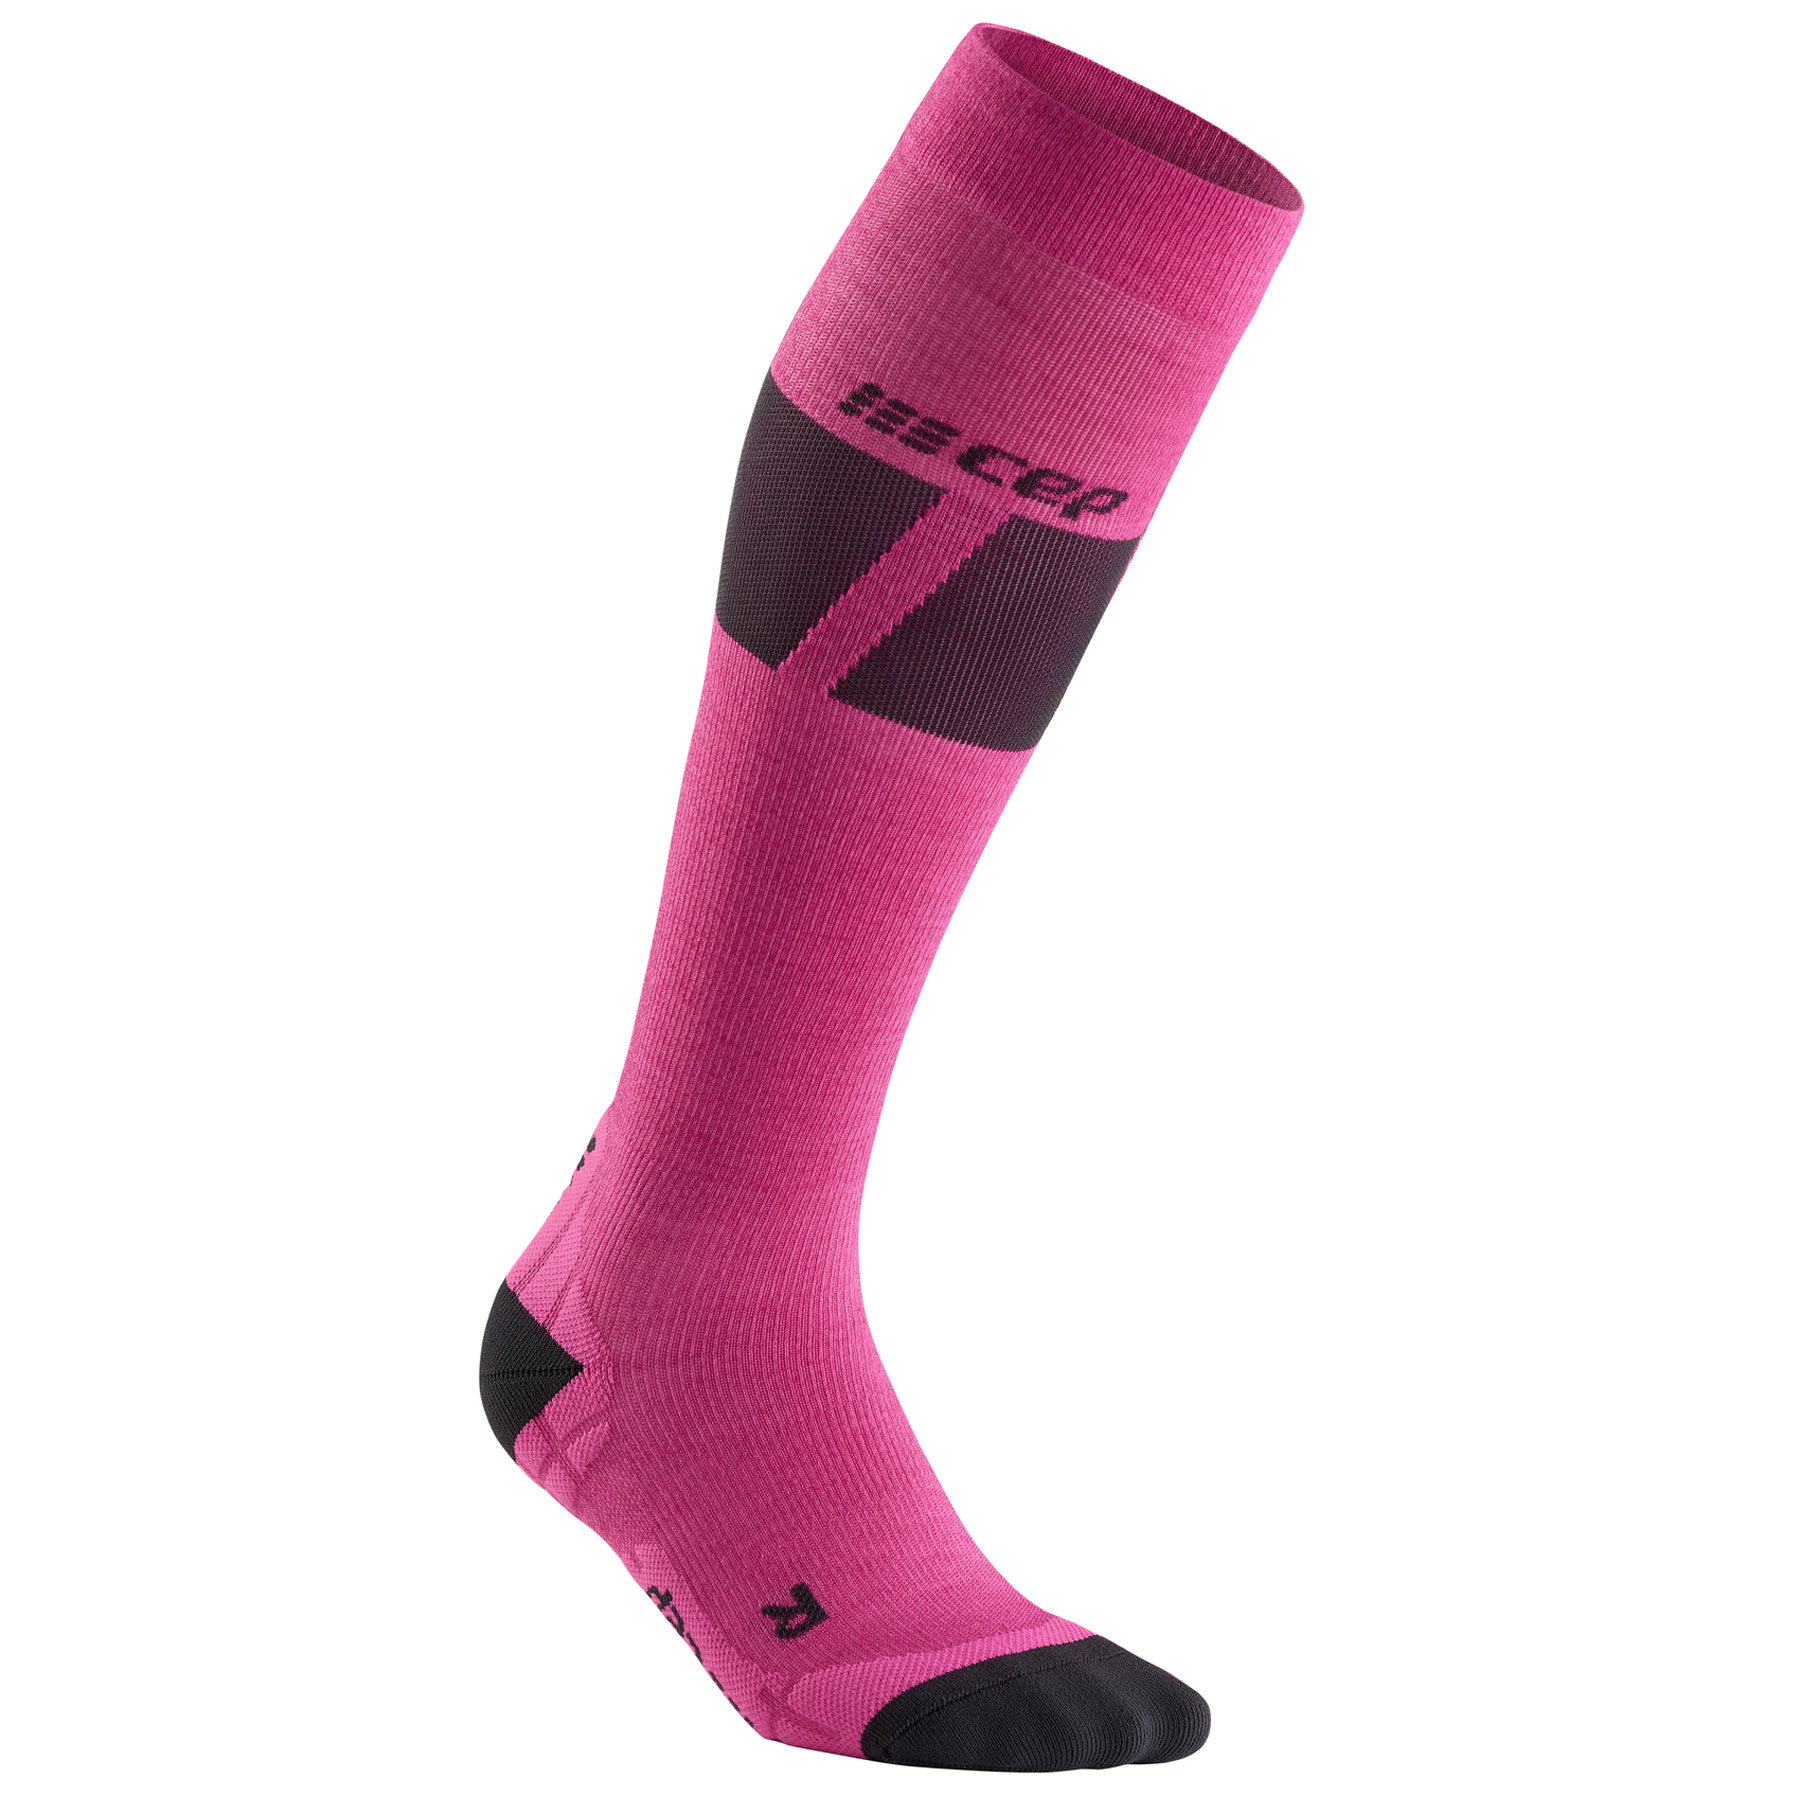 CEP Ski Ultralight Compression Socks Women - pink/dark grey